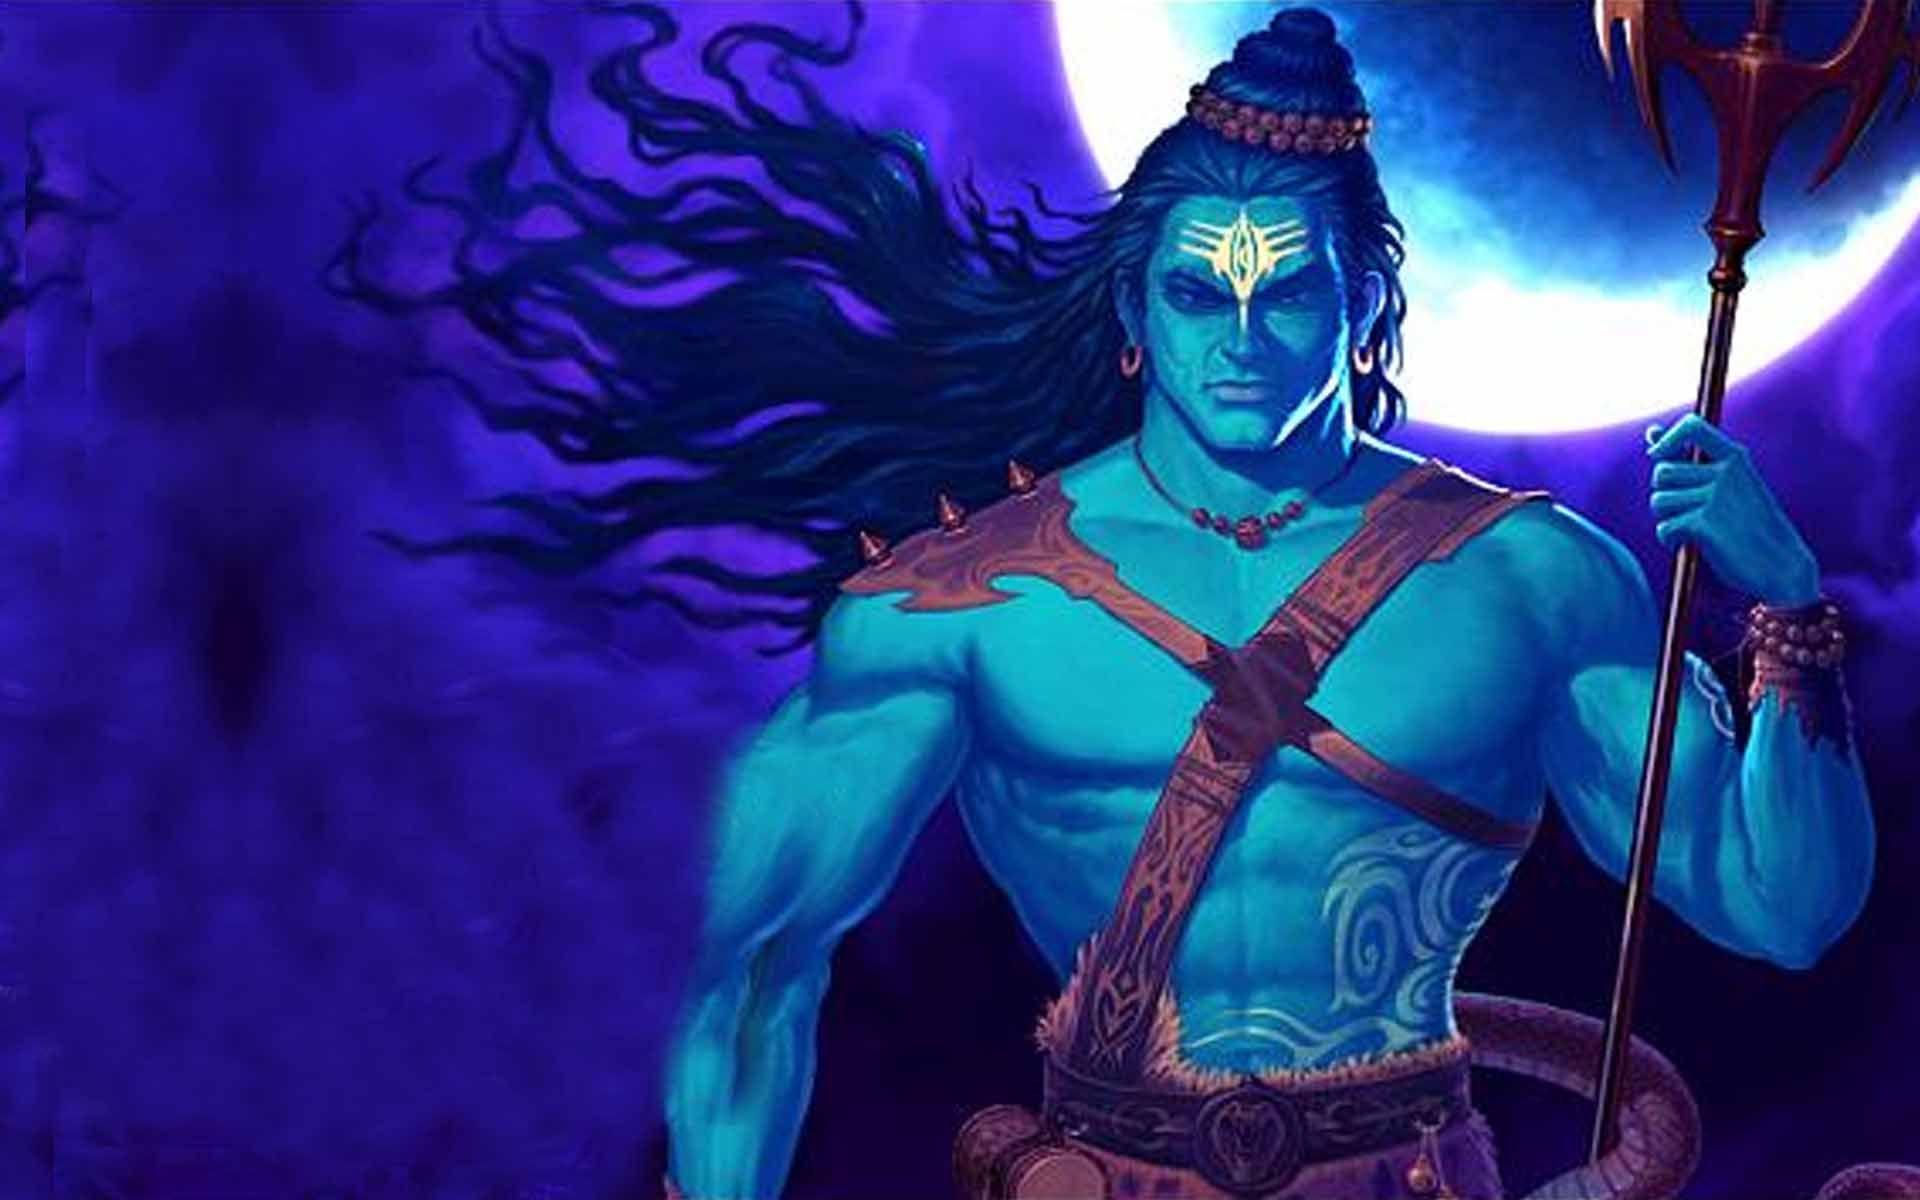 Shiv shankar hd wallpaper download 963762